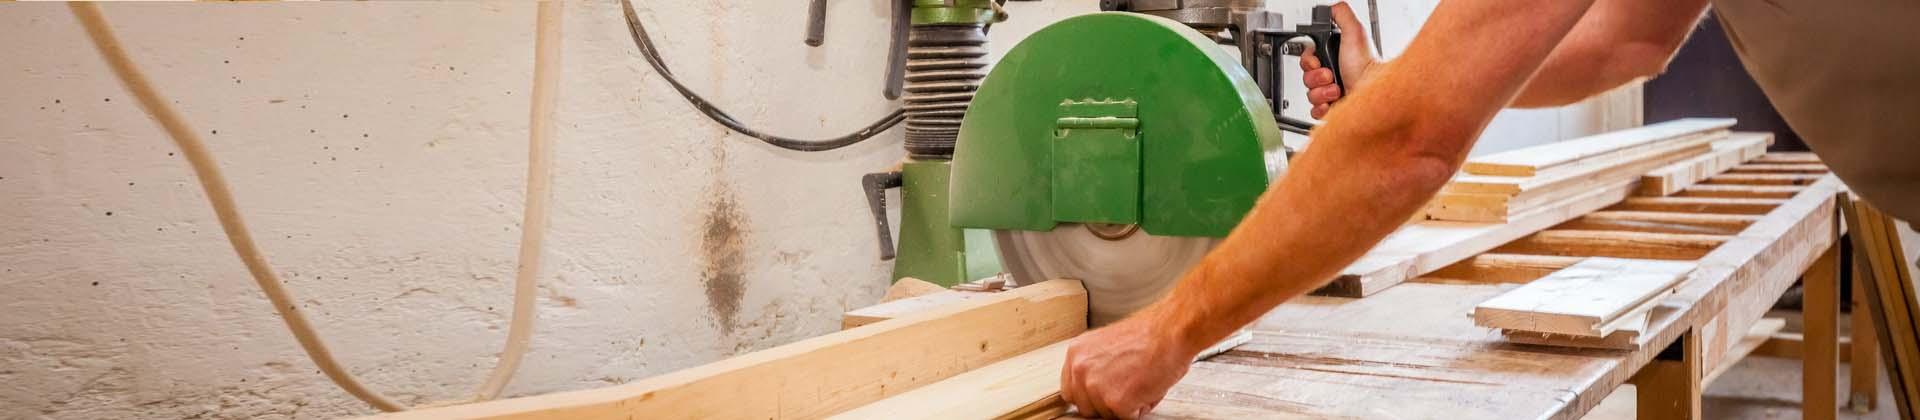 drvene-kuce-nadogradnja